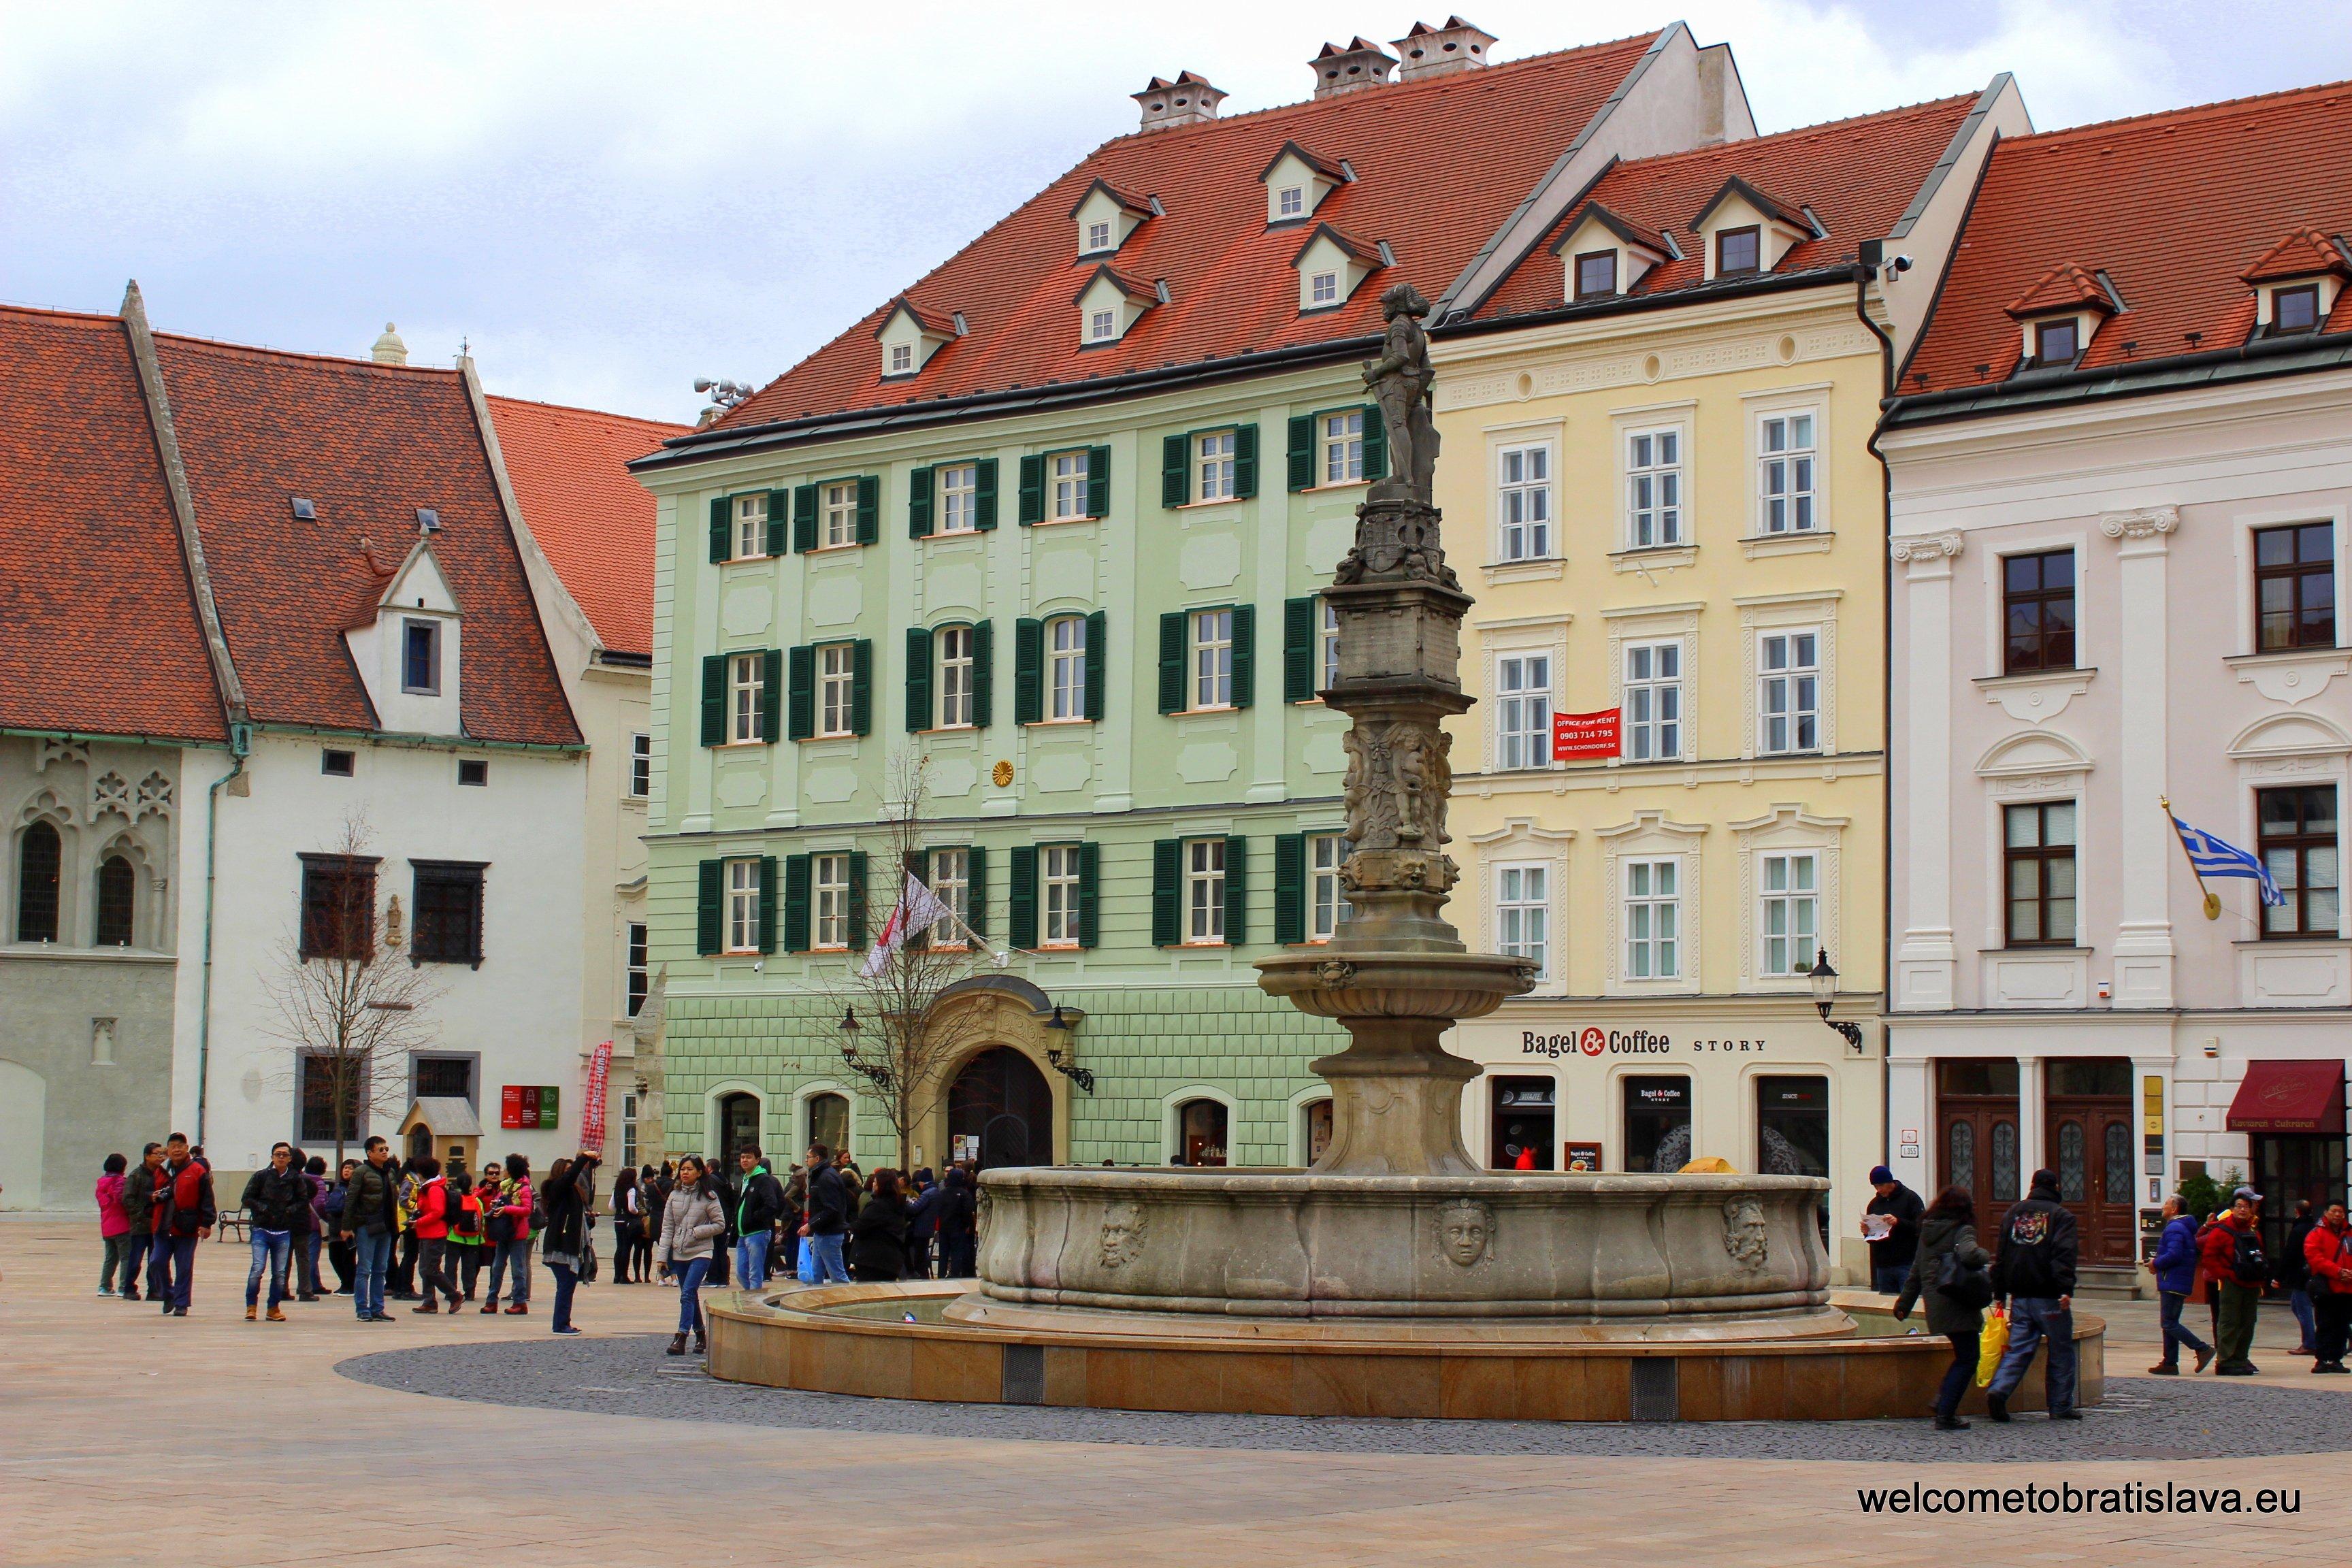 Coronation journey - the Main Square